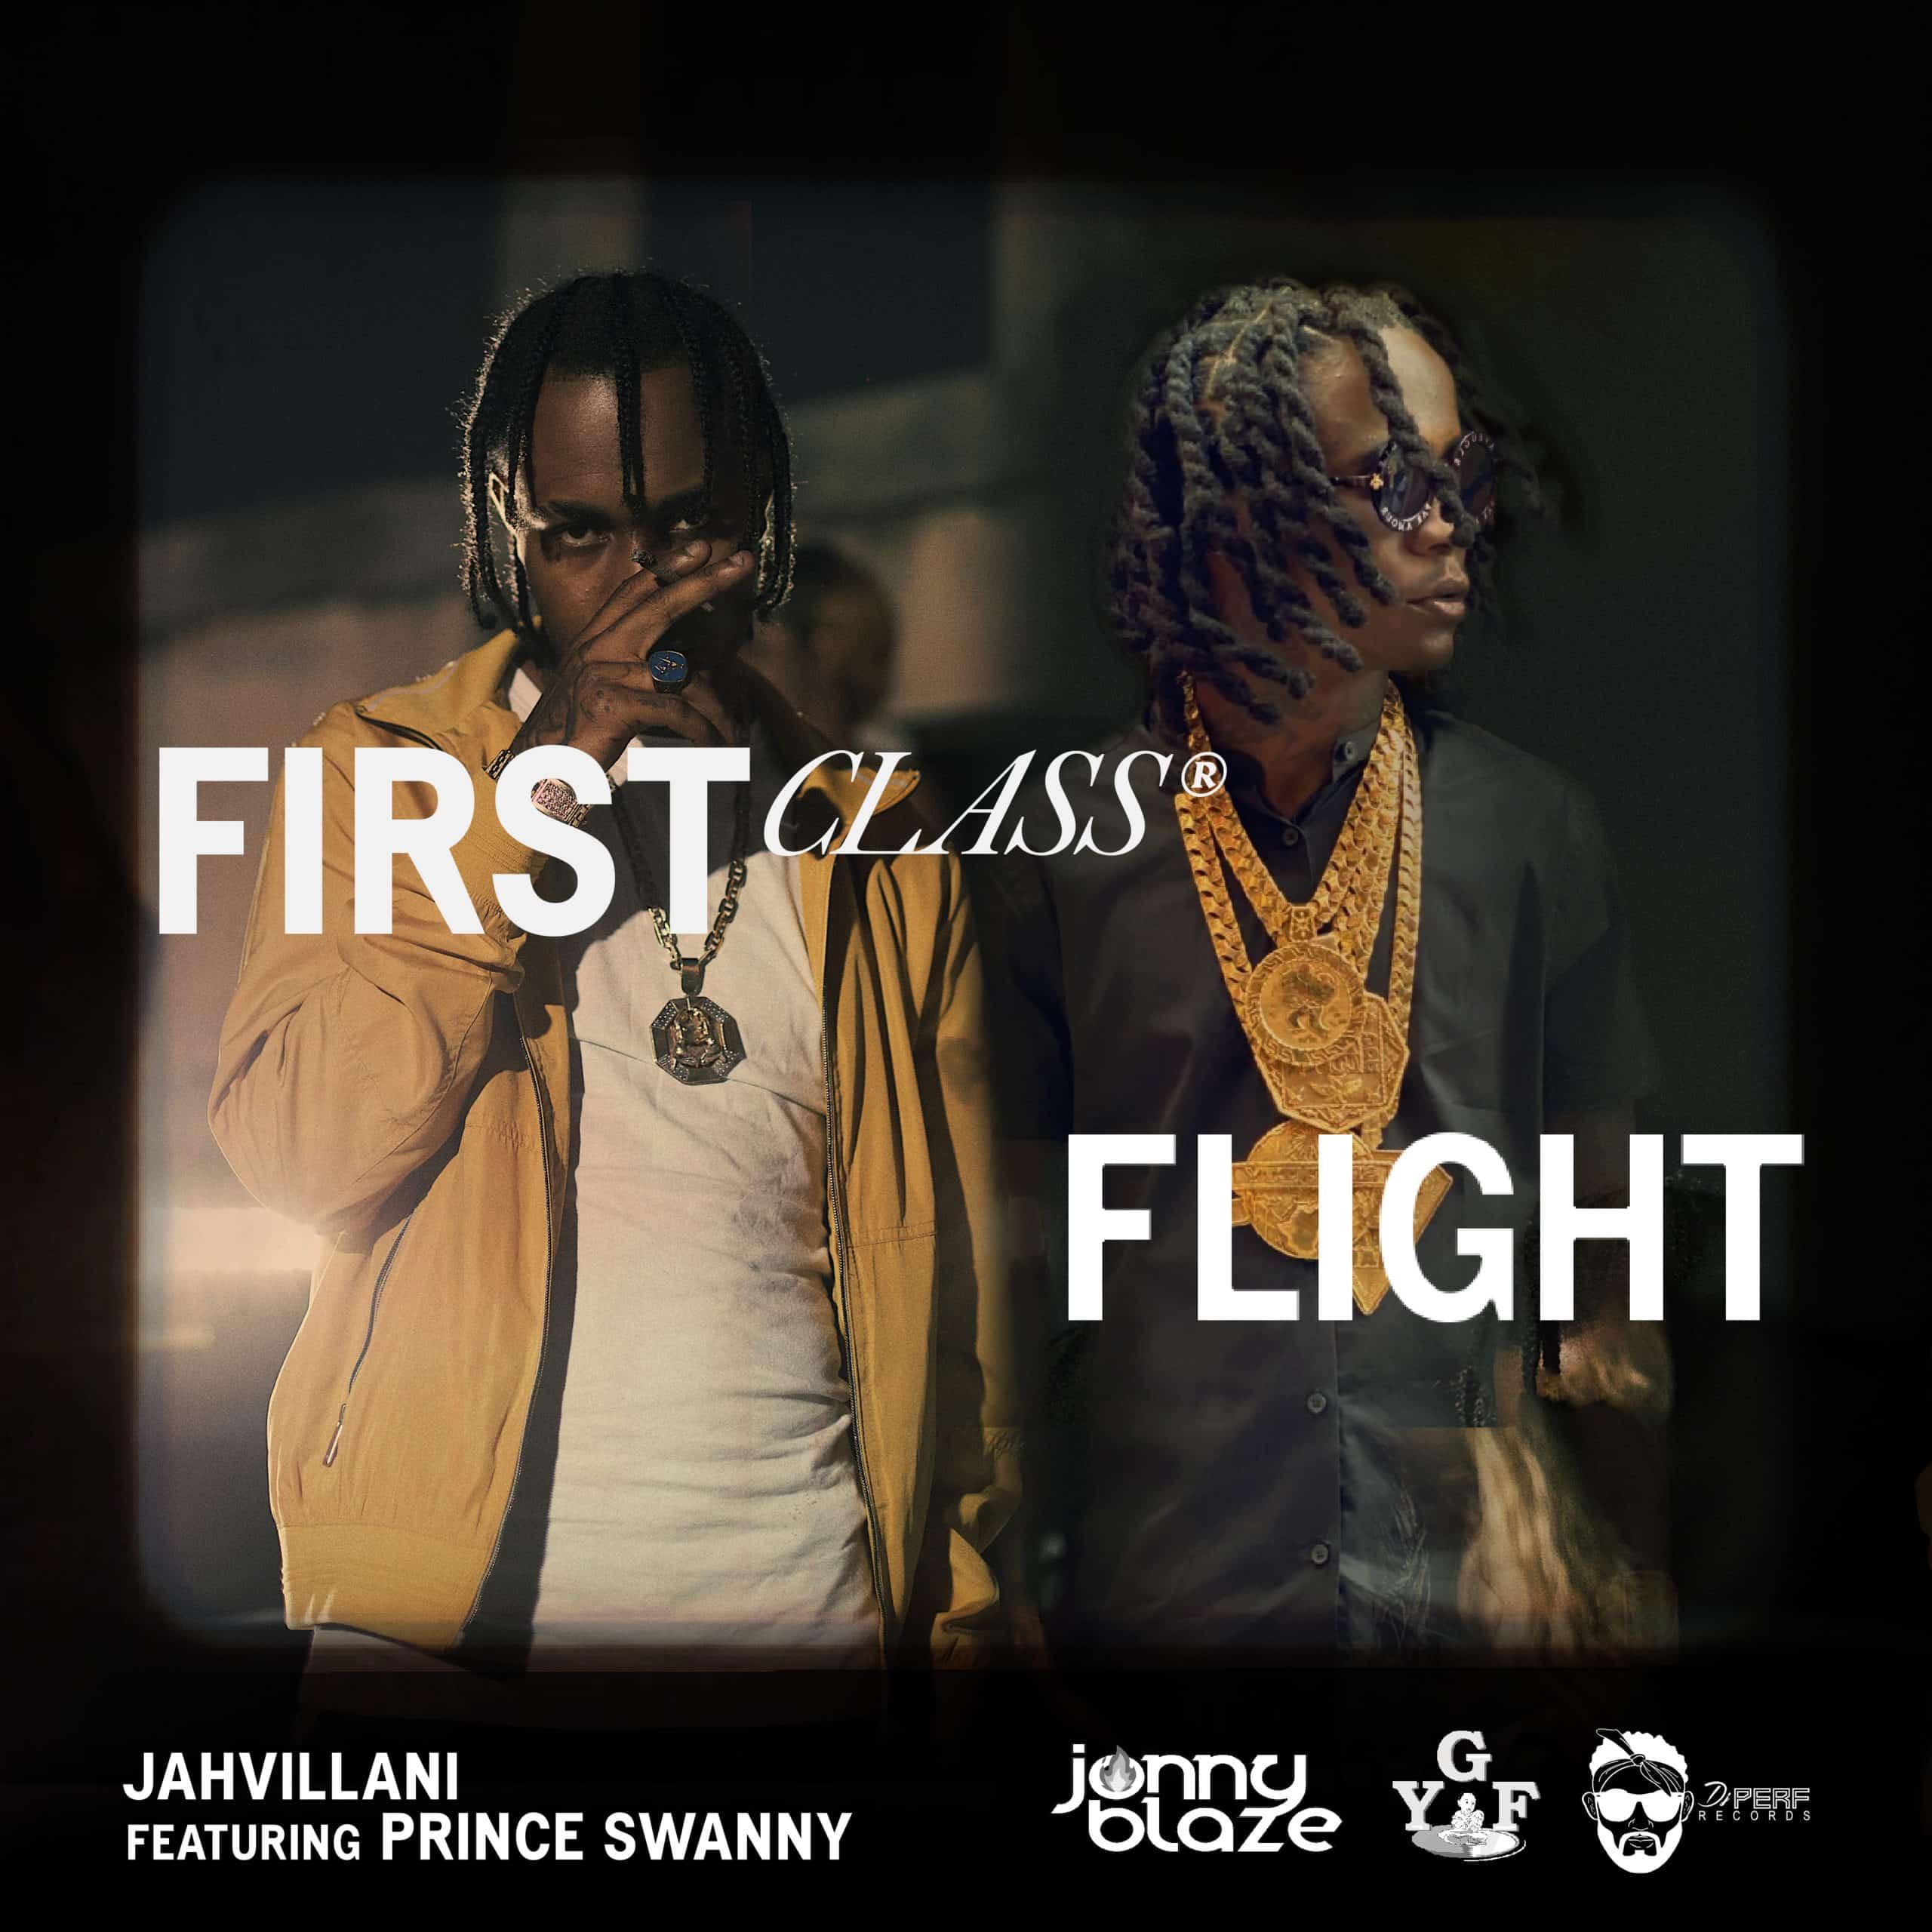 Jahvillani ft. Prince Swanny - First Class Flight